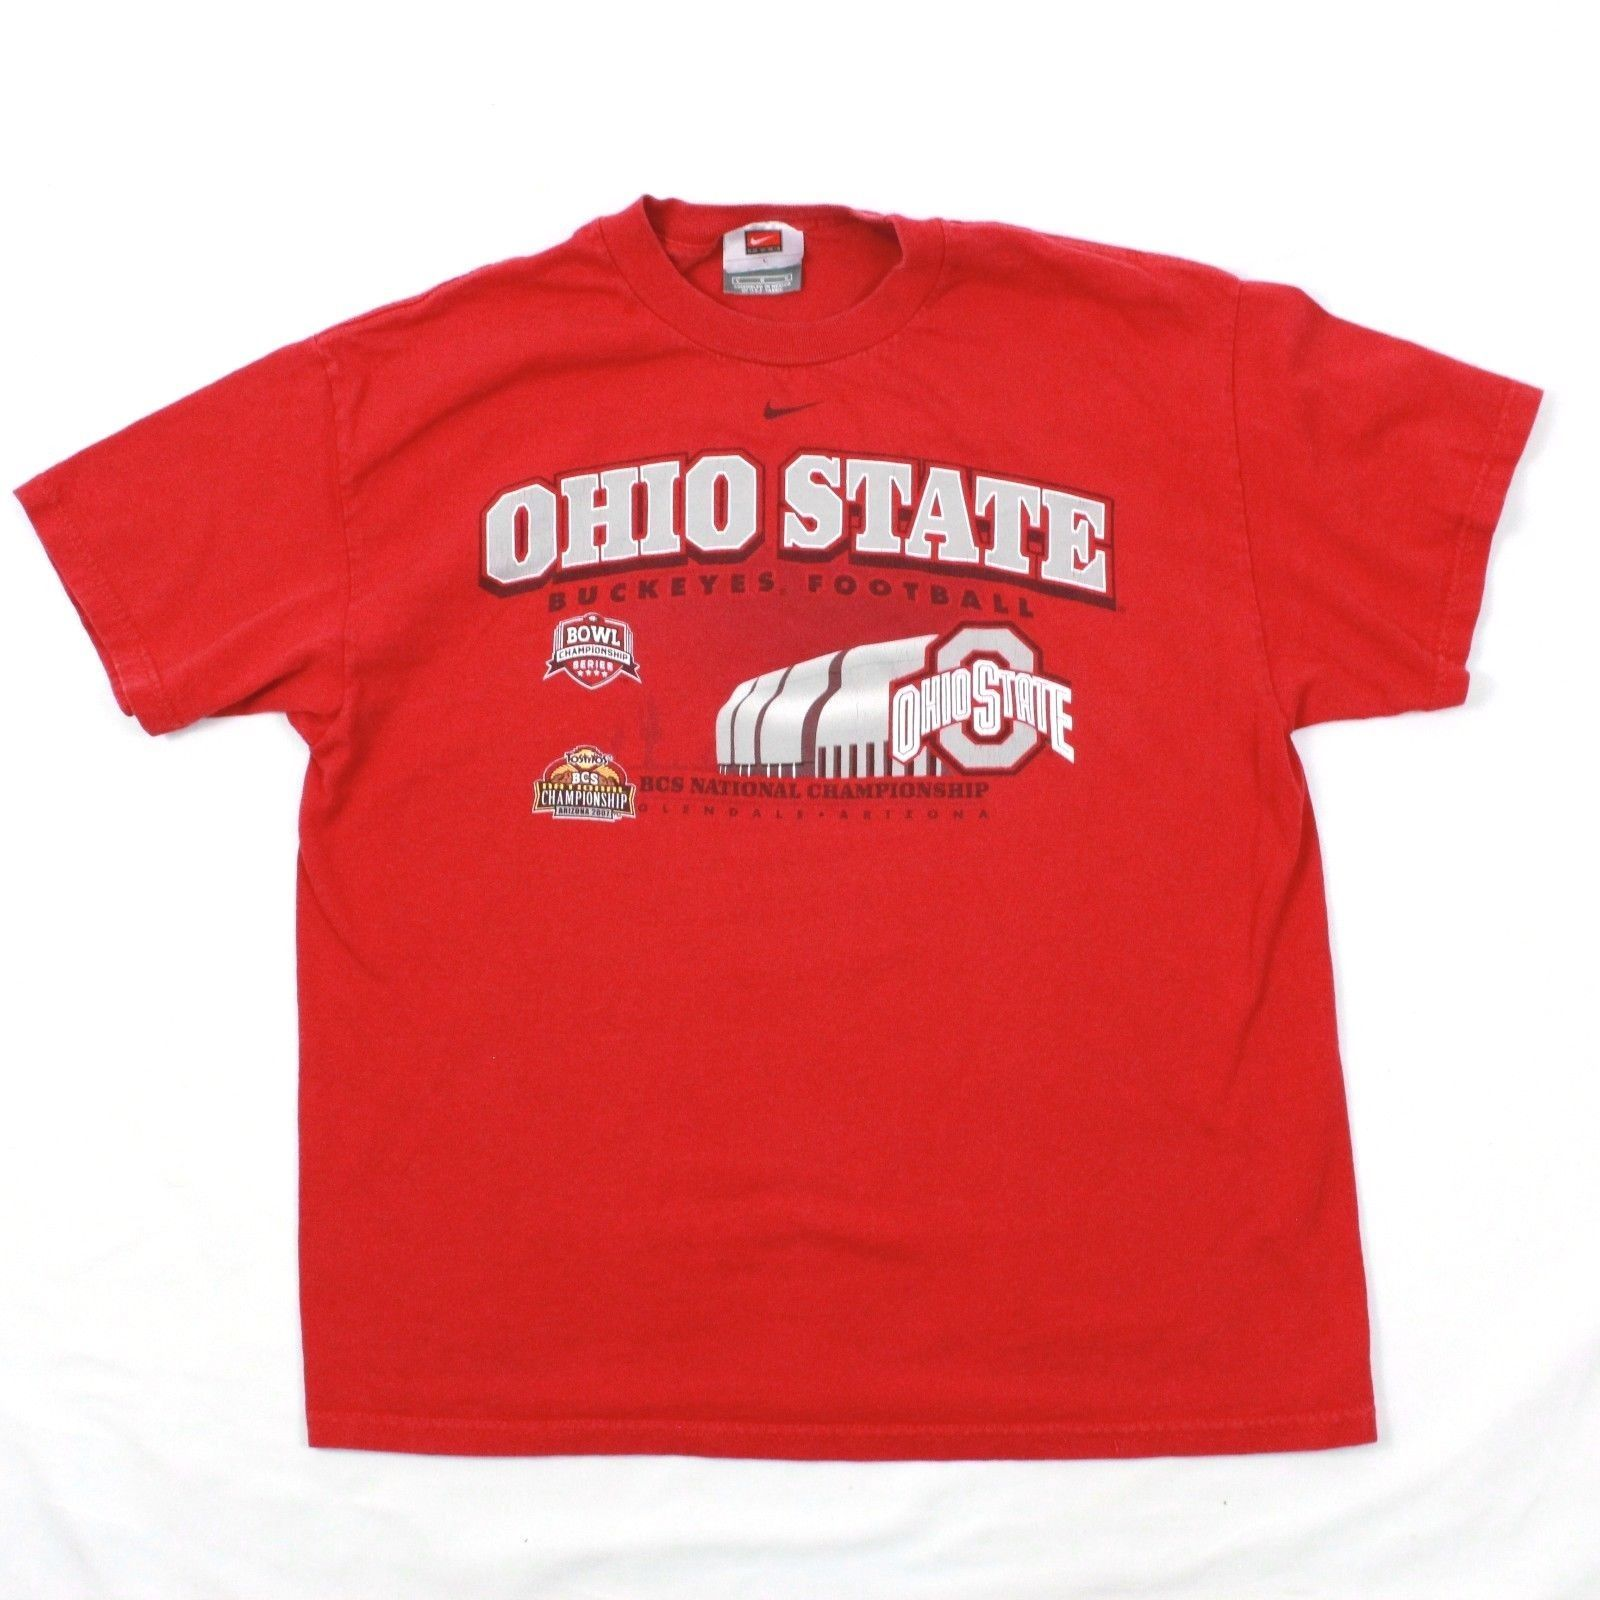 1d43f2a7d Nike Ohio État Buckeys T-Shirt L T-Shirt 2007 Football Tostitos Bol  Champions - $19.81